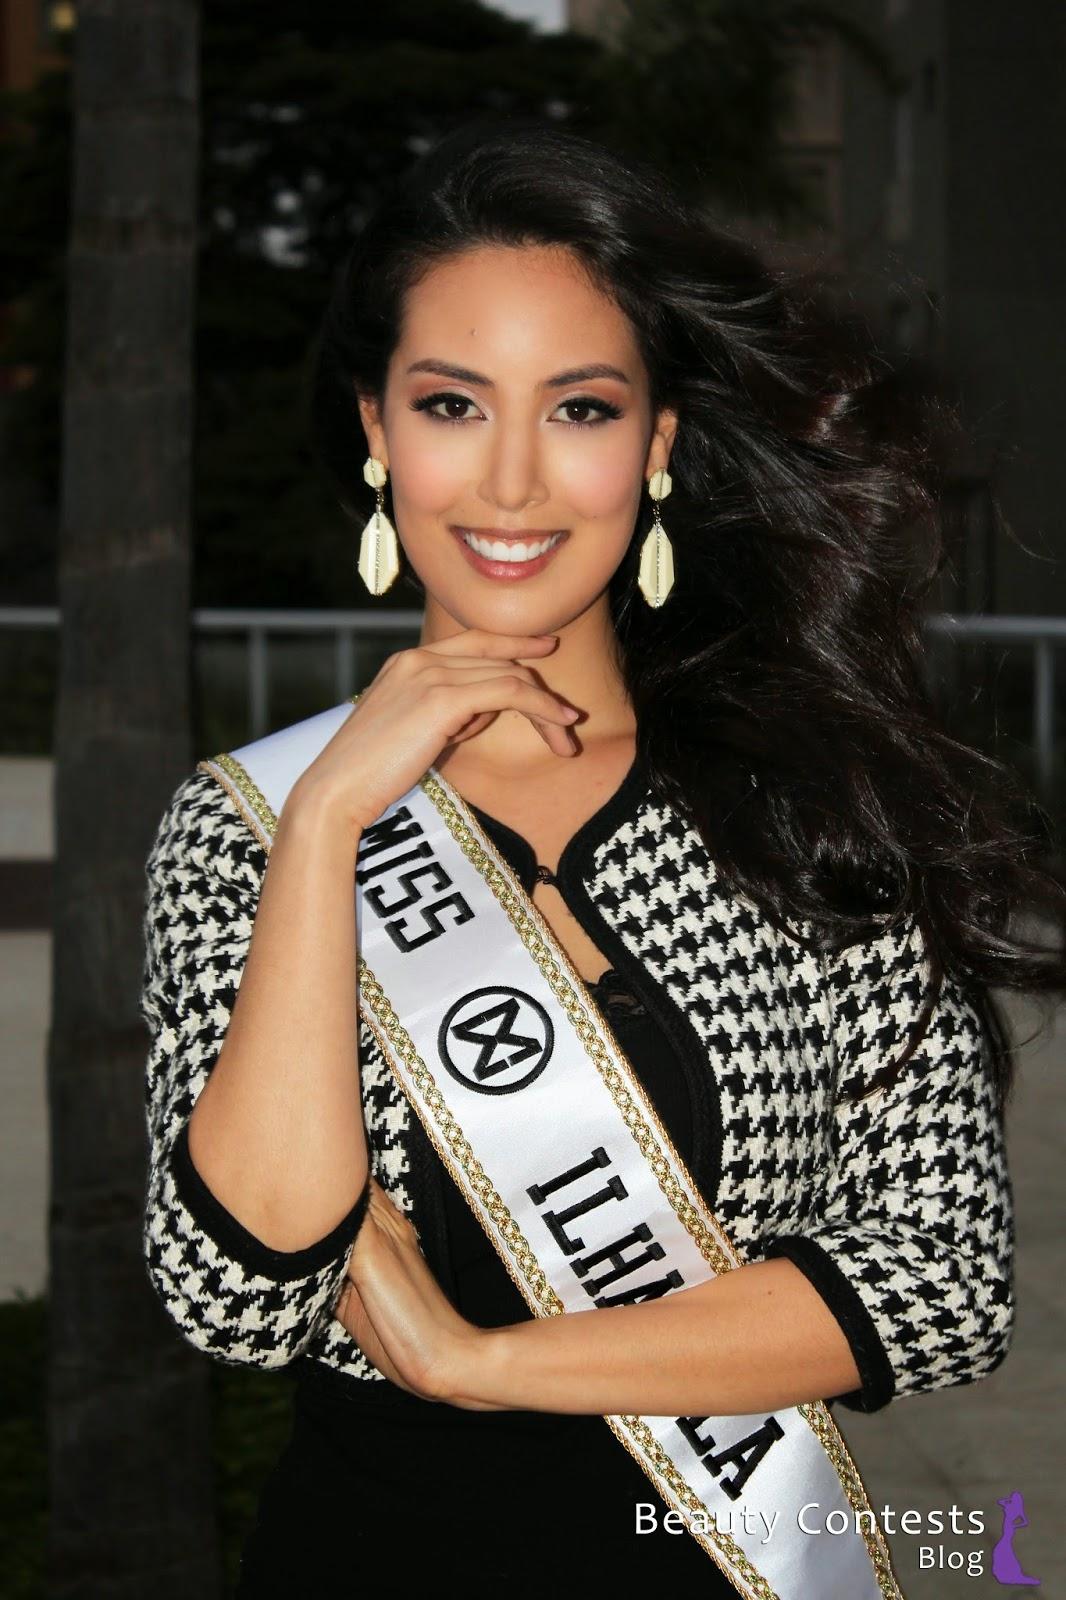 brasil rainha das americas no miss mundo 2015. Catharina-Song-ee-Choi-Nunes-Miss-Mundo-Ilhabela-2015-World-BeautyContestsBlog-02